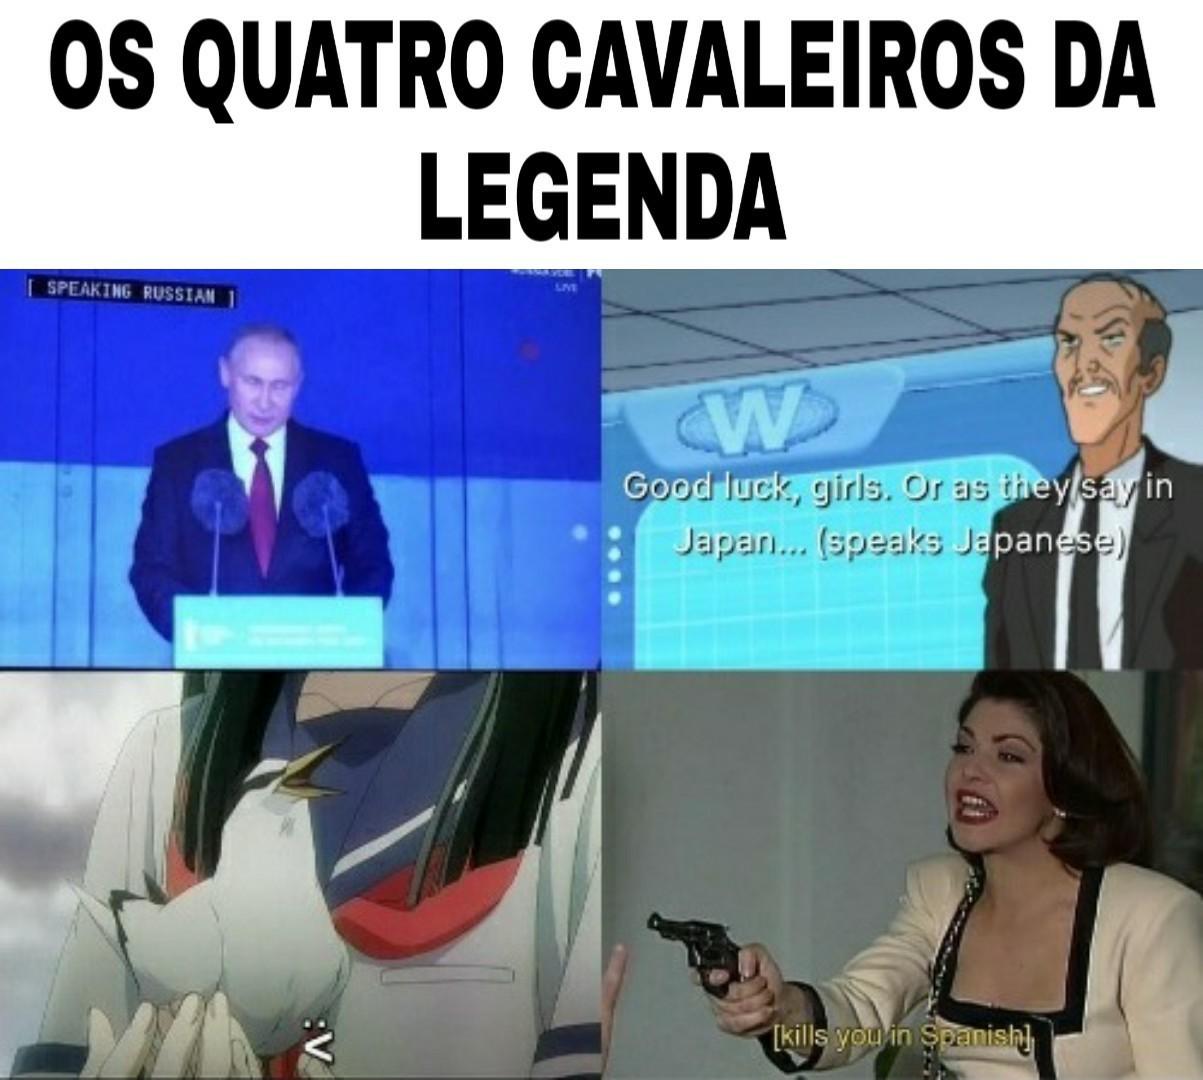 Legenda - meme